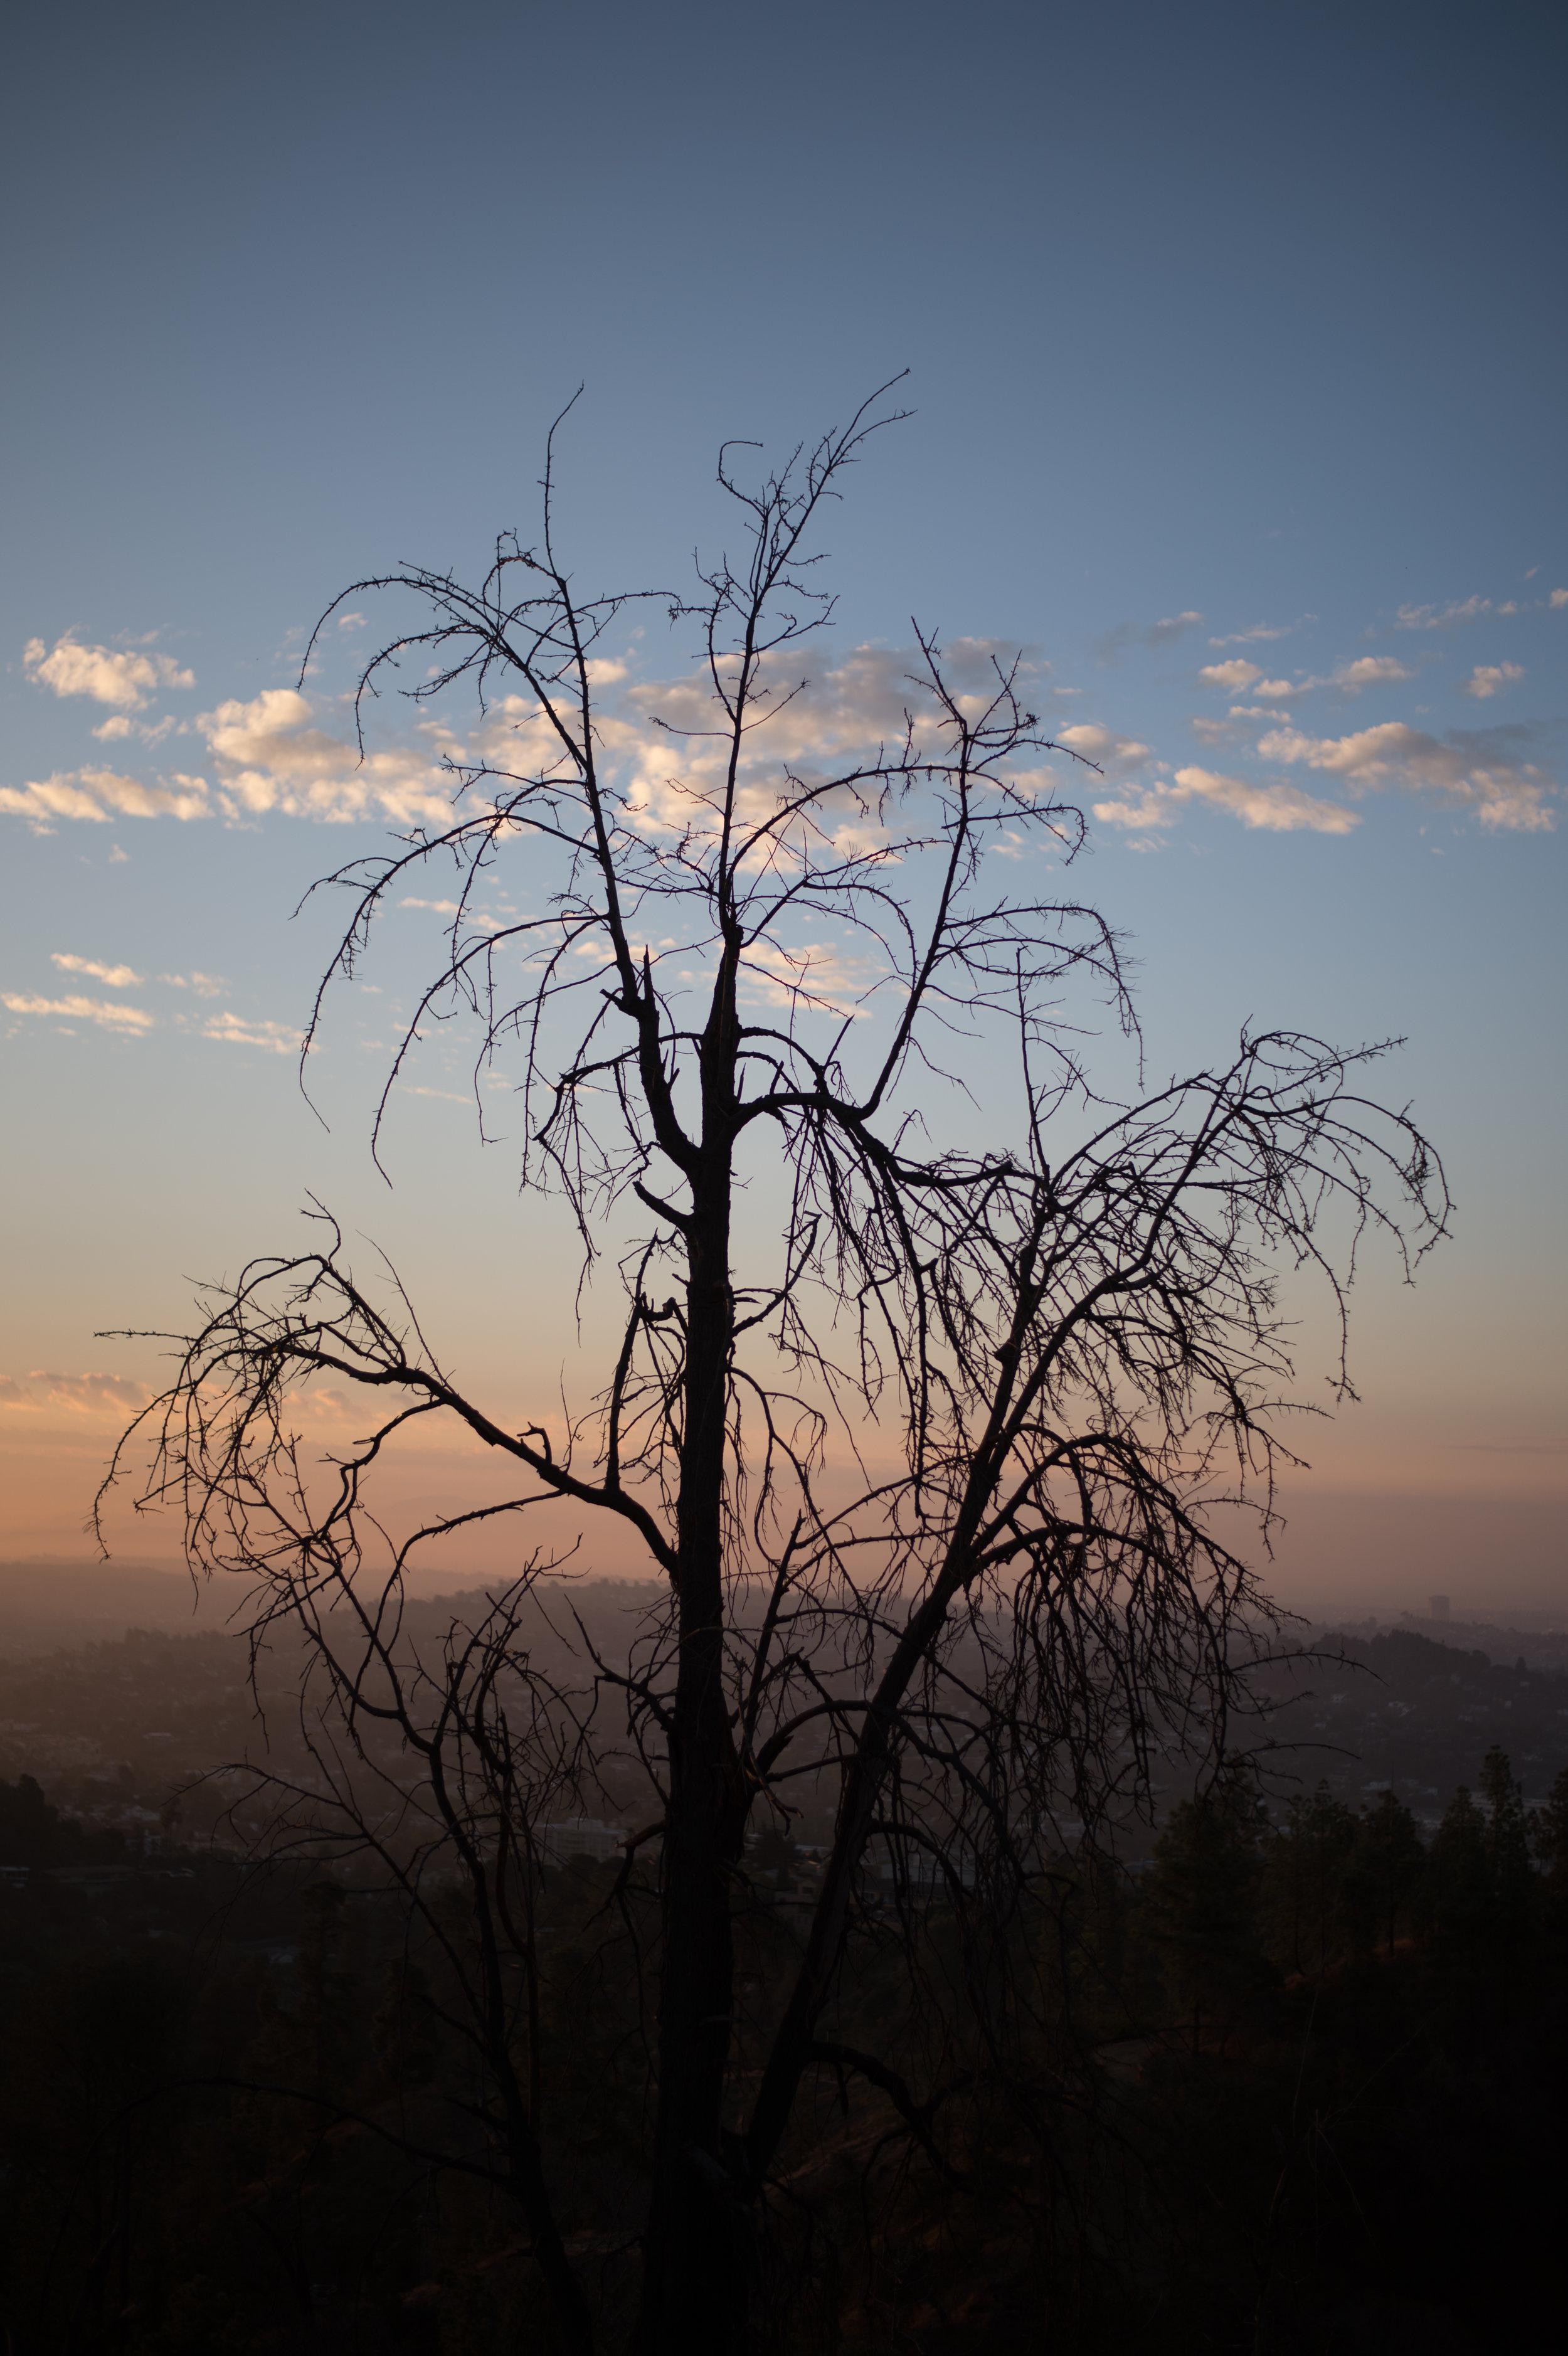 LA-Los-Angeles-Photo-Diary-The-Glossier-46.jpg